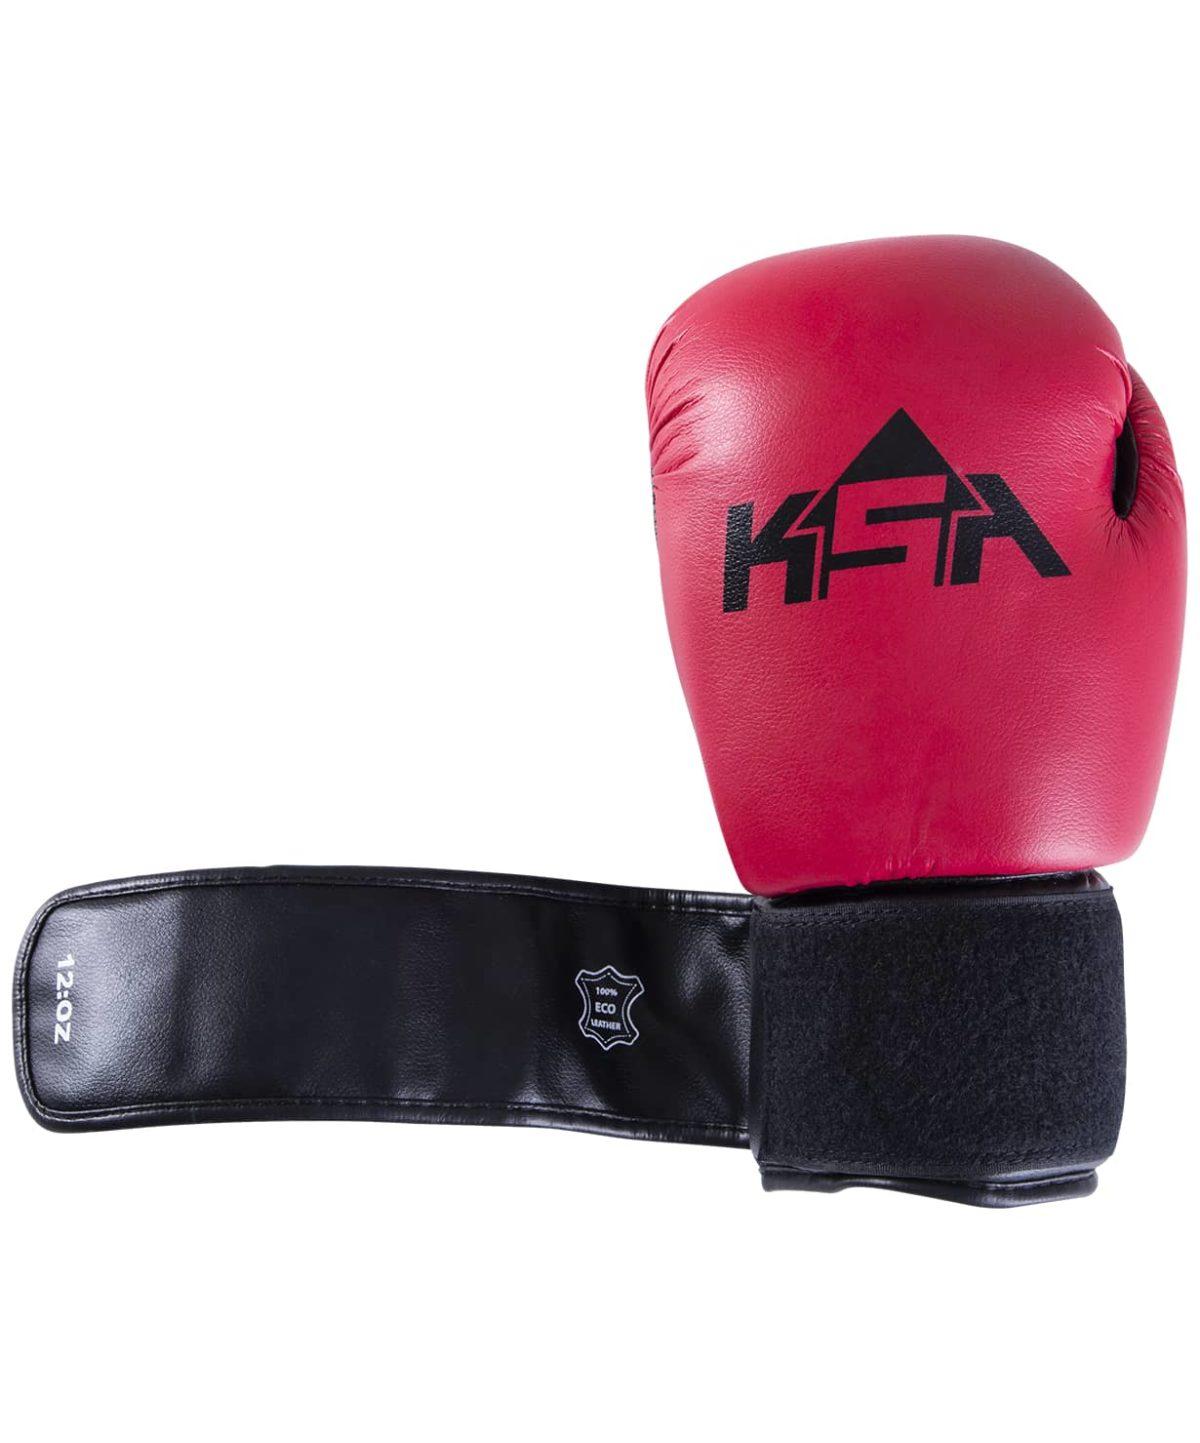 KSA Spider Red Перчатки боксерские, 10 oz, к/з  17812 - 2